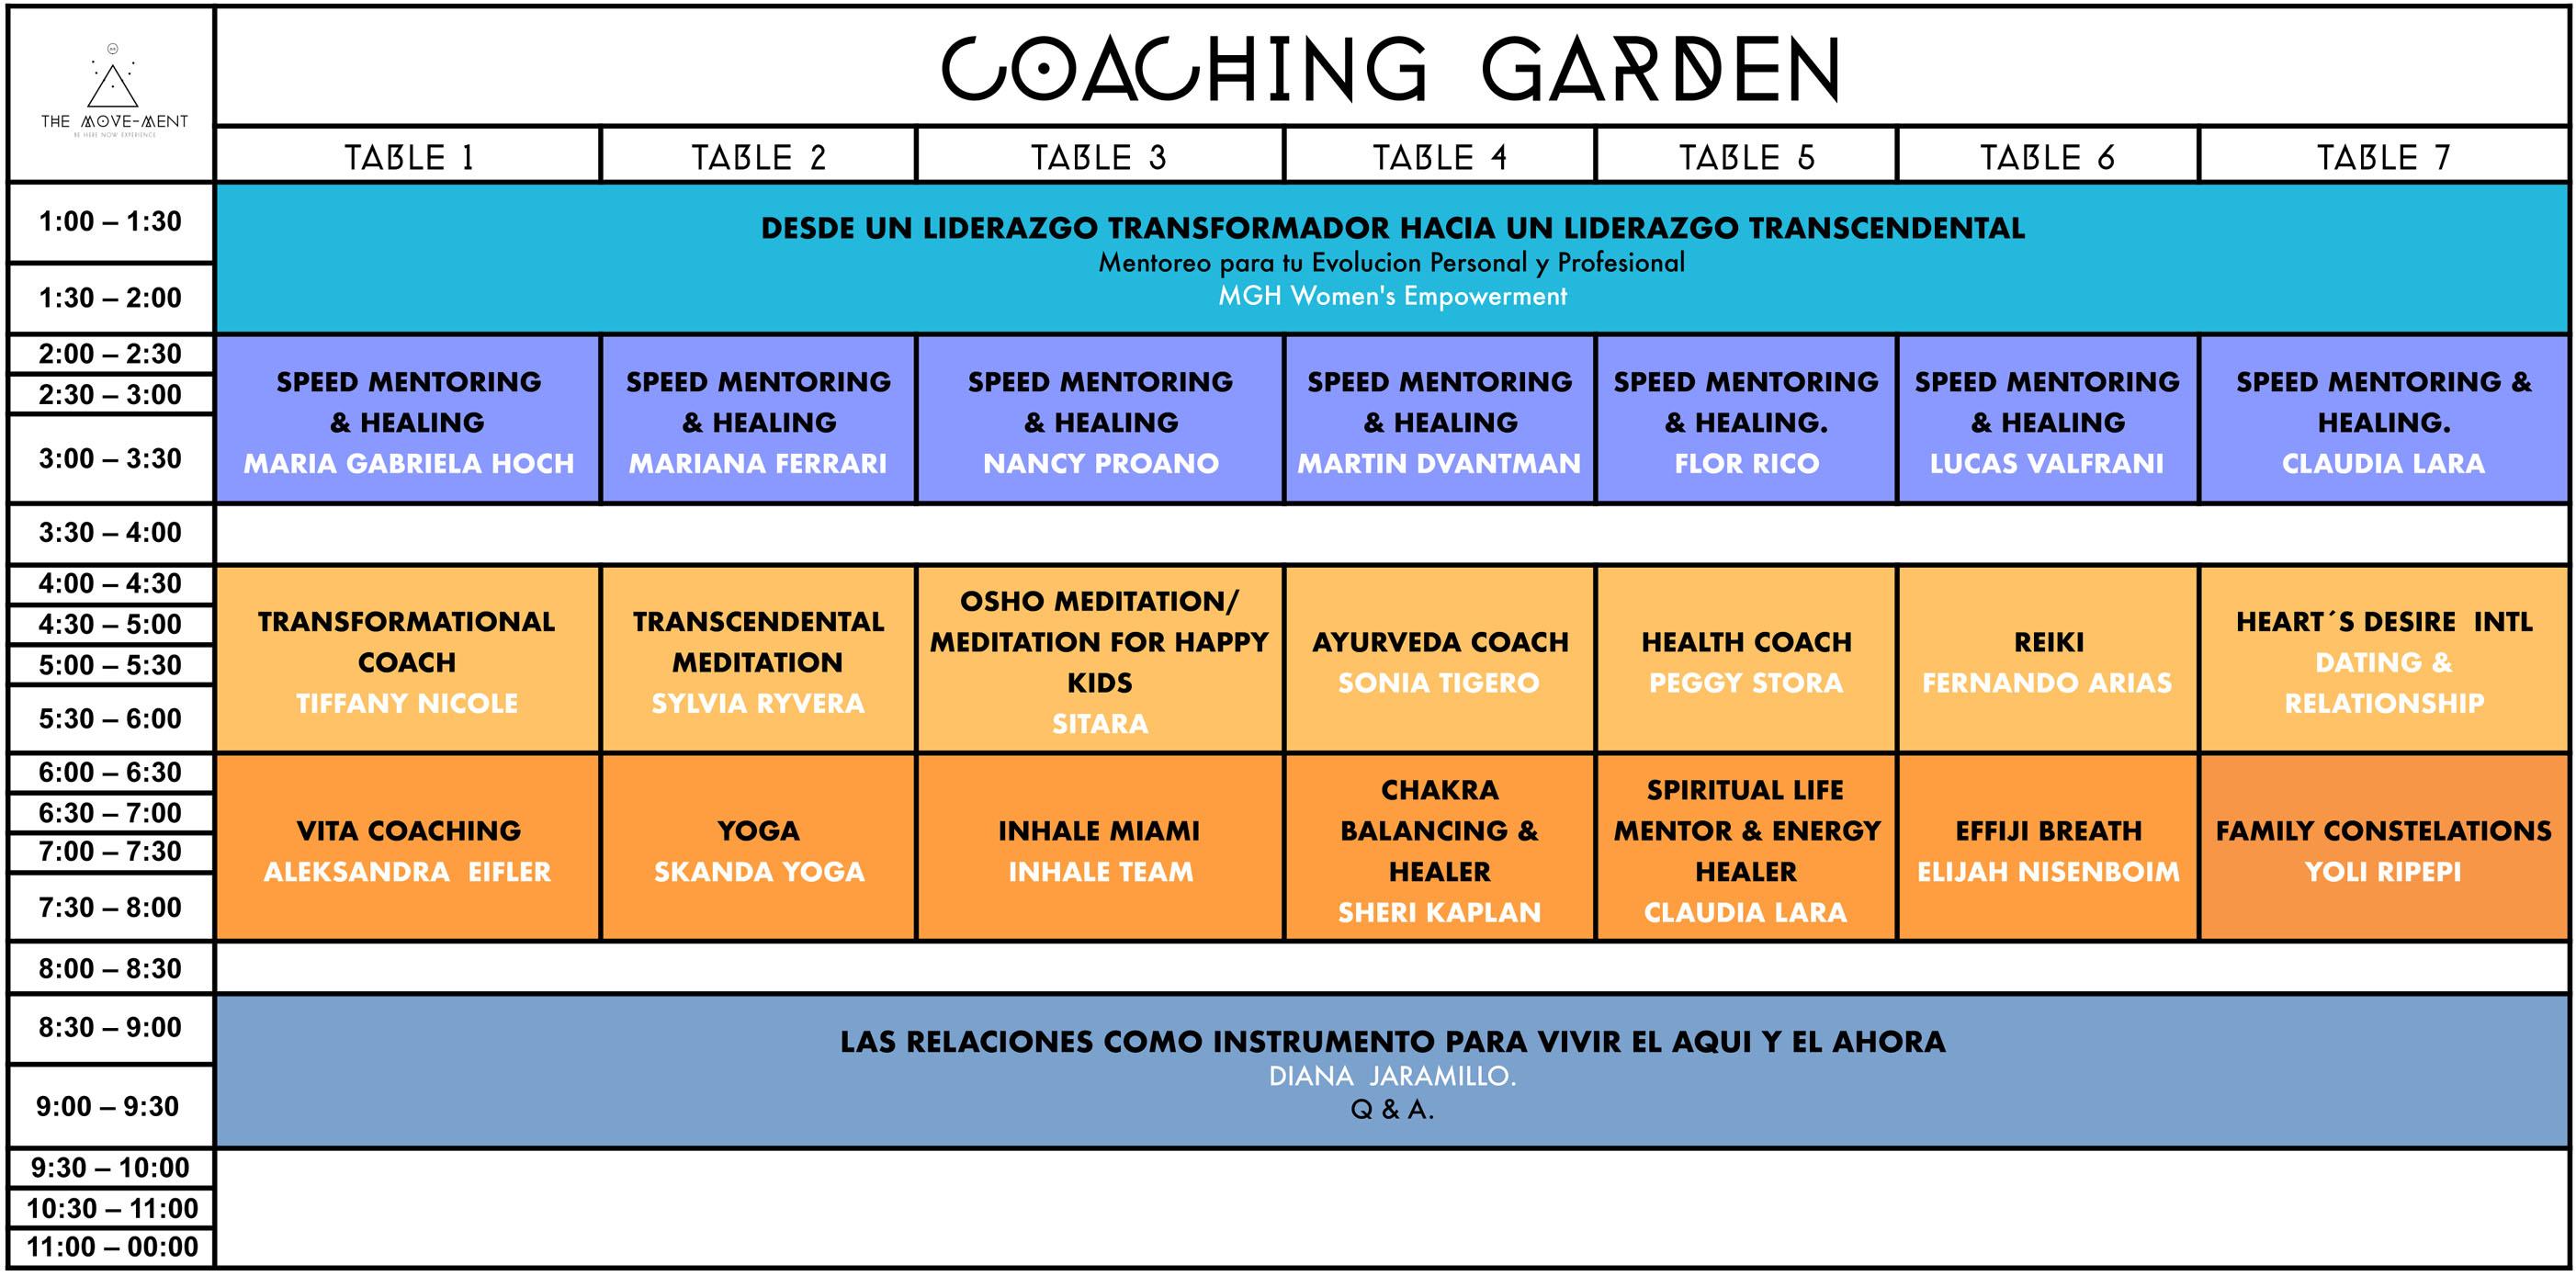 Coaching garden the move-ment